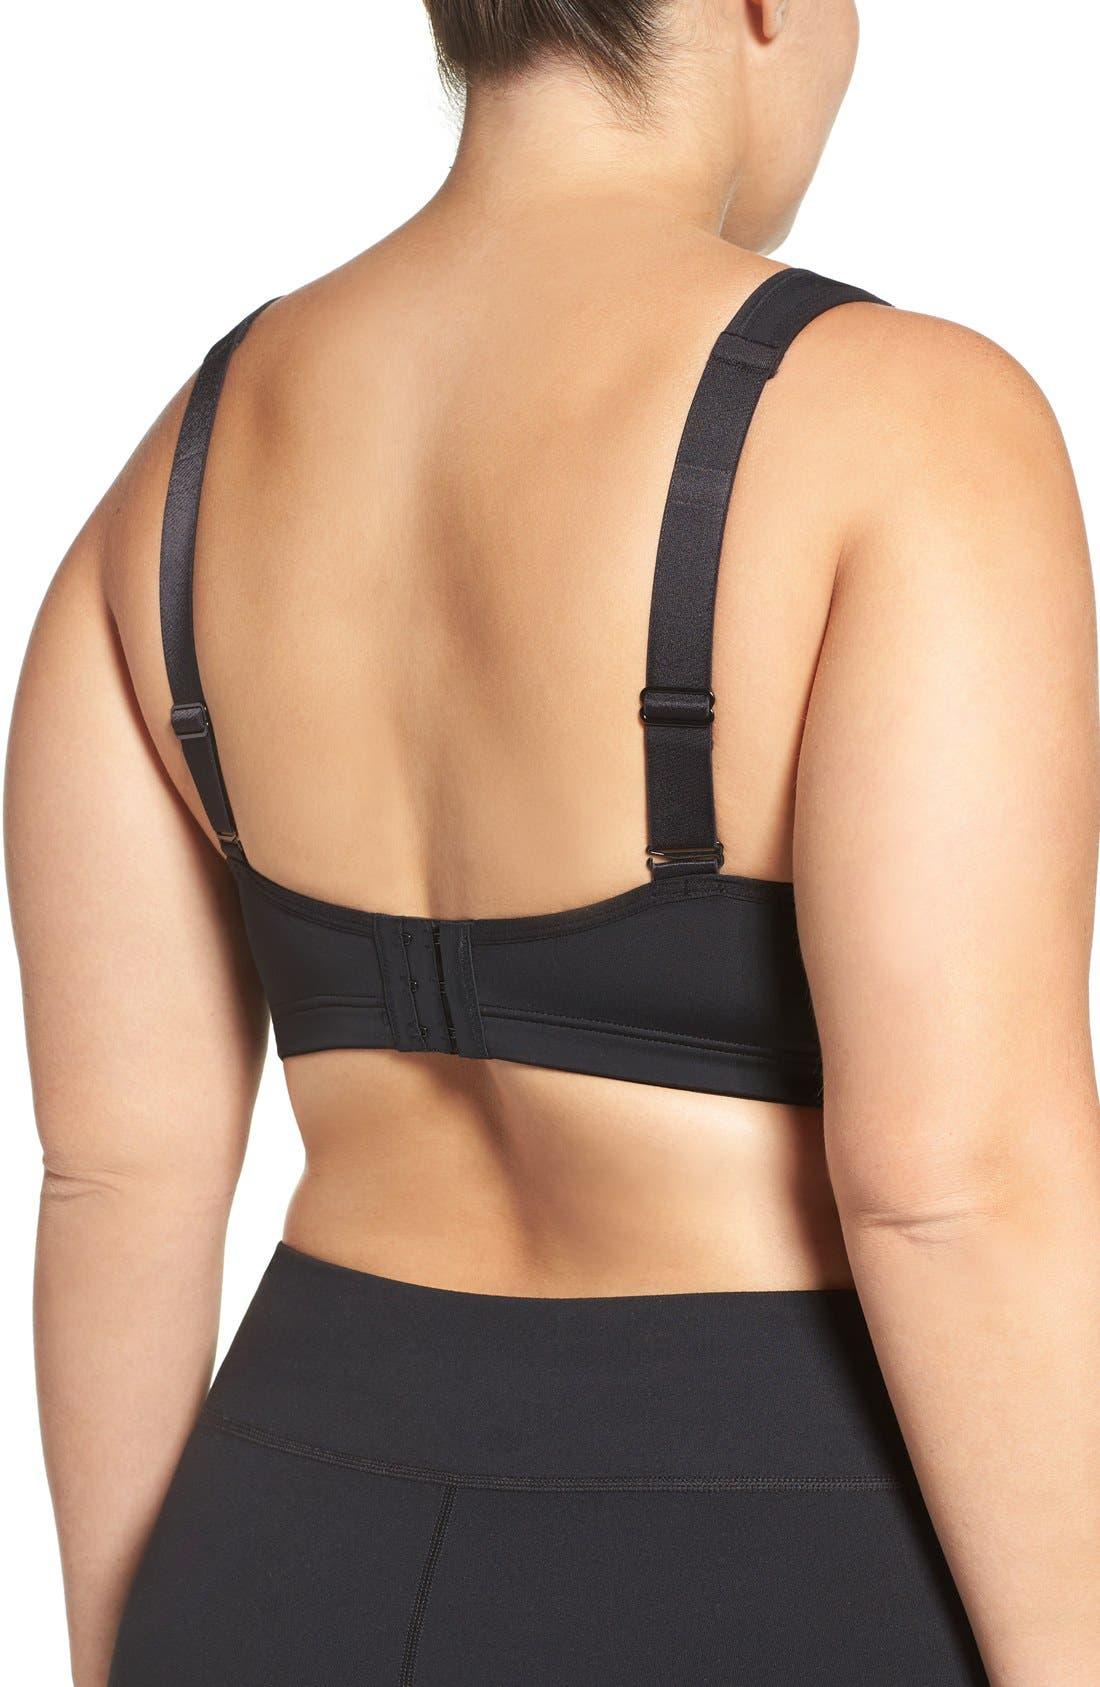 Alternate Image 2  - Marika Curves 'Gabriella' Underwire Sports Bra (Plus Size)